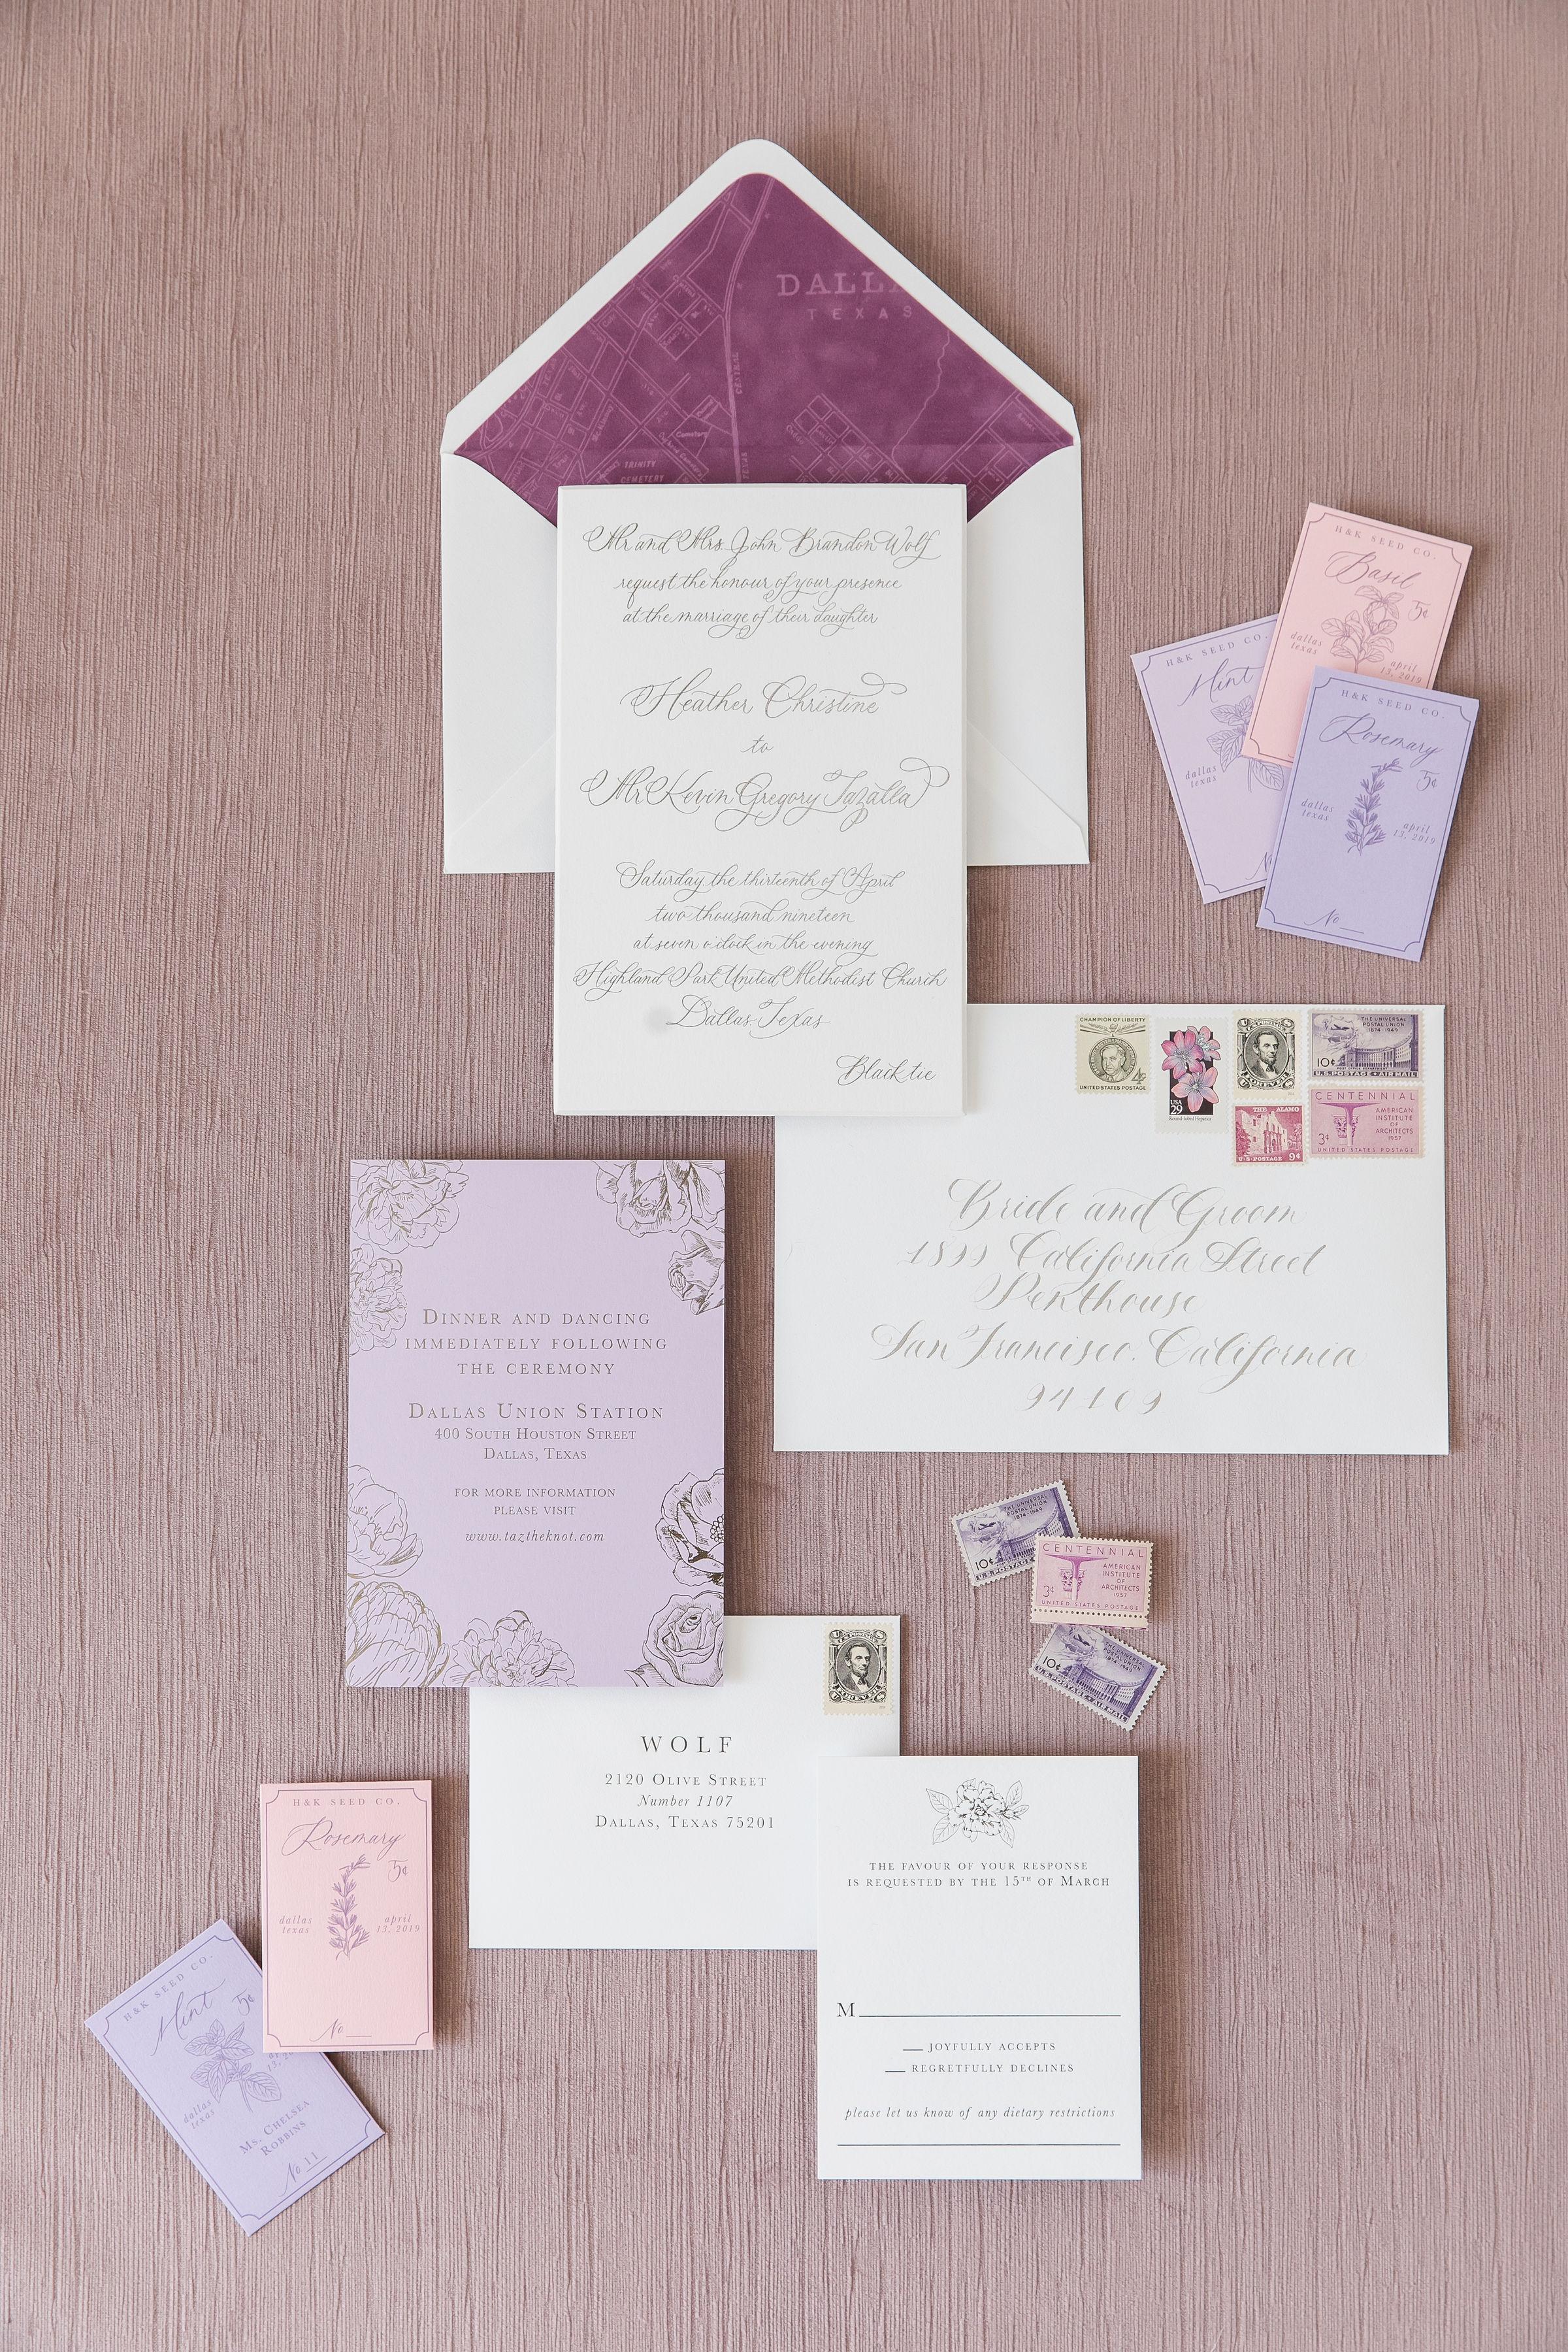 Stationery Details - Dallas, Texas - Spring Wedding - Julian Leaver Events